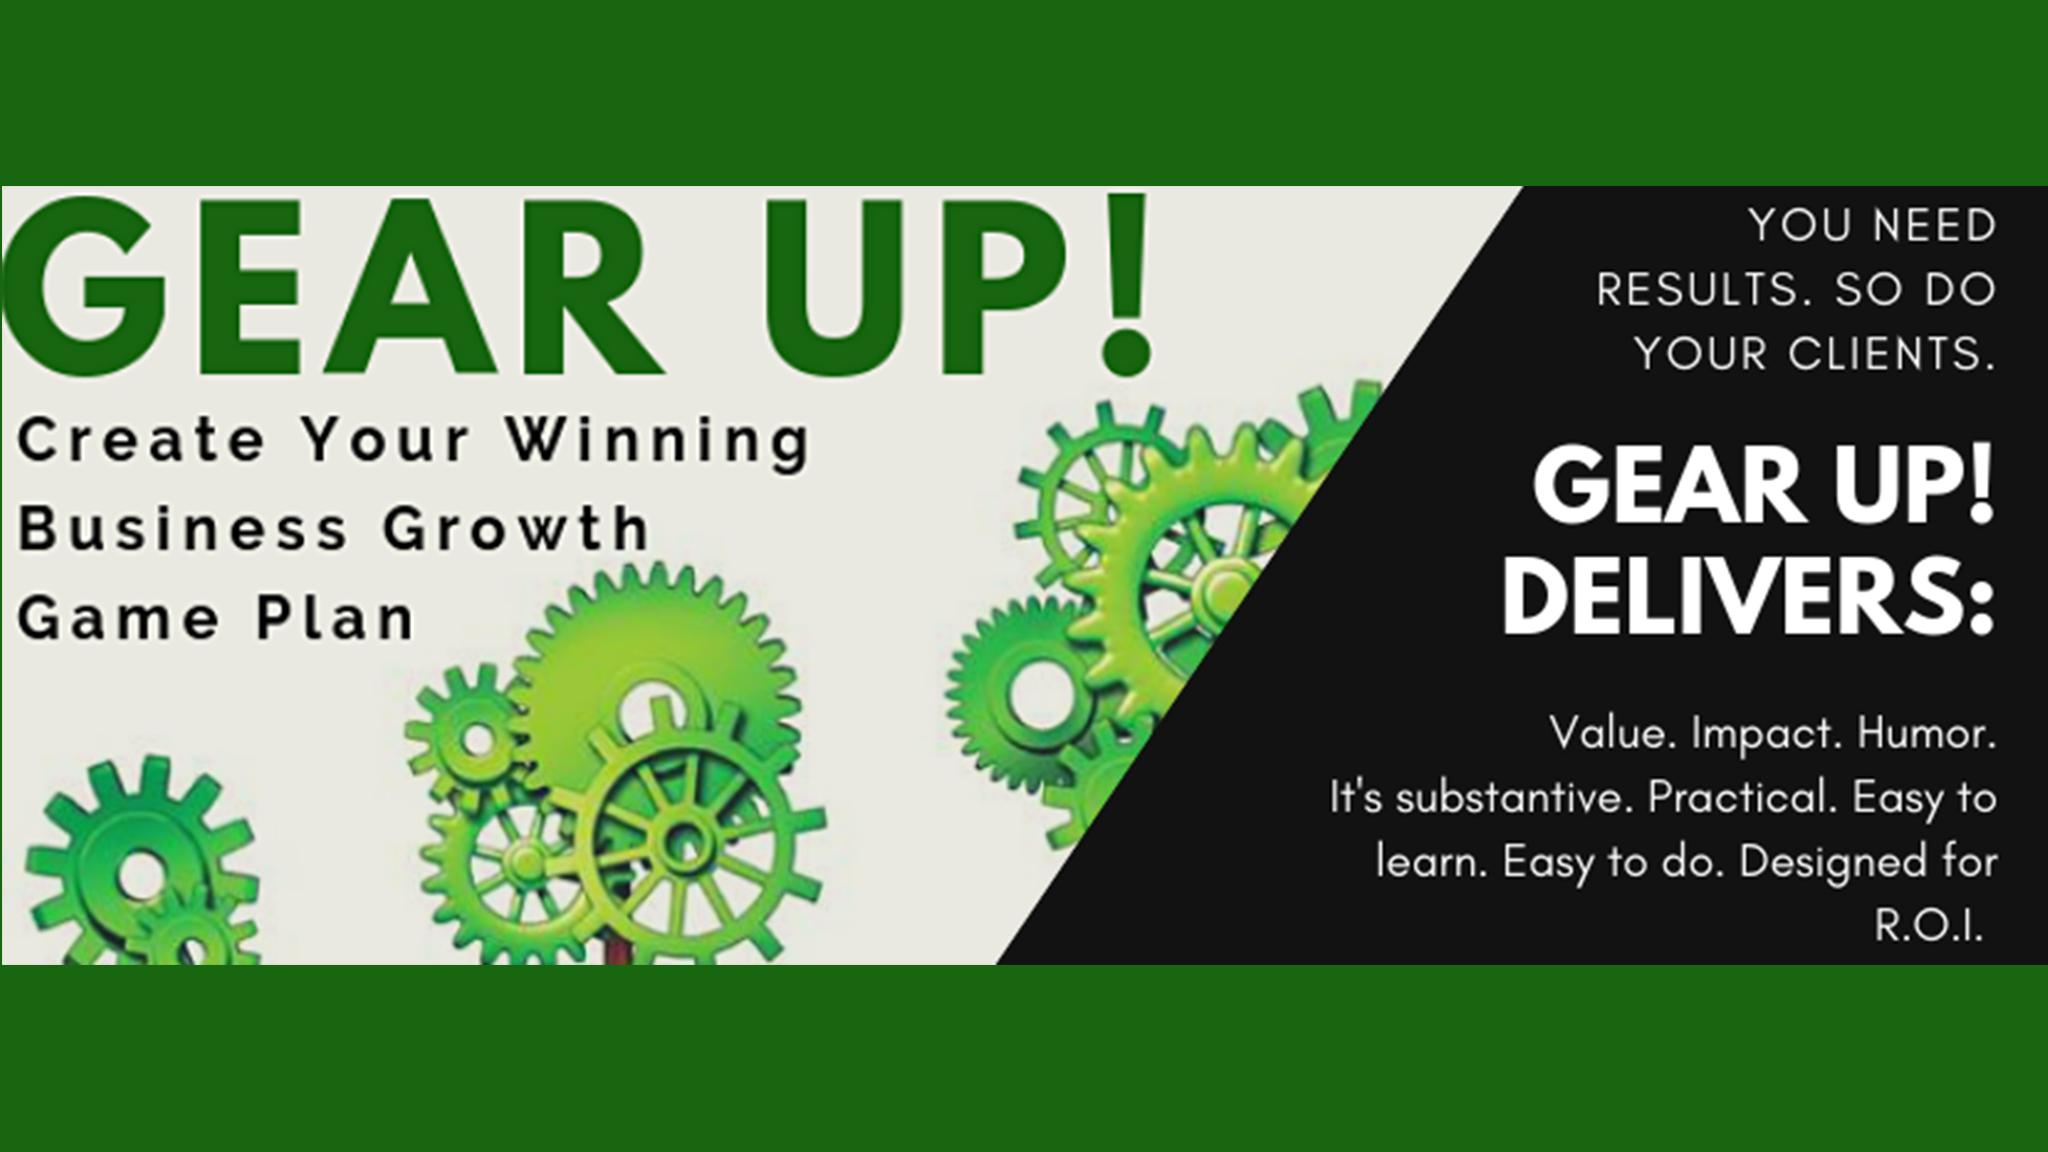 GEAR UP 2019! Kickstart Your Business Growth for the Next 12 Months!